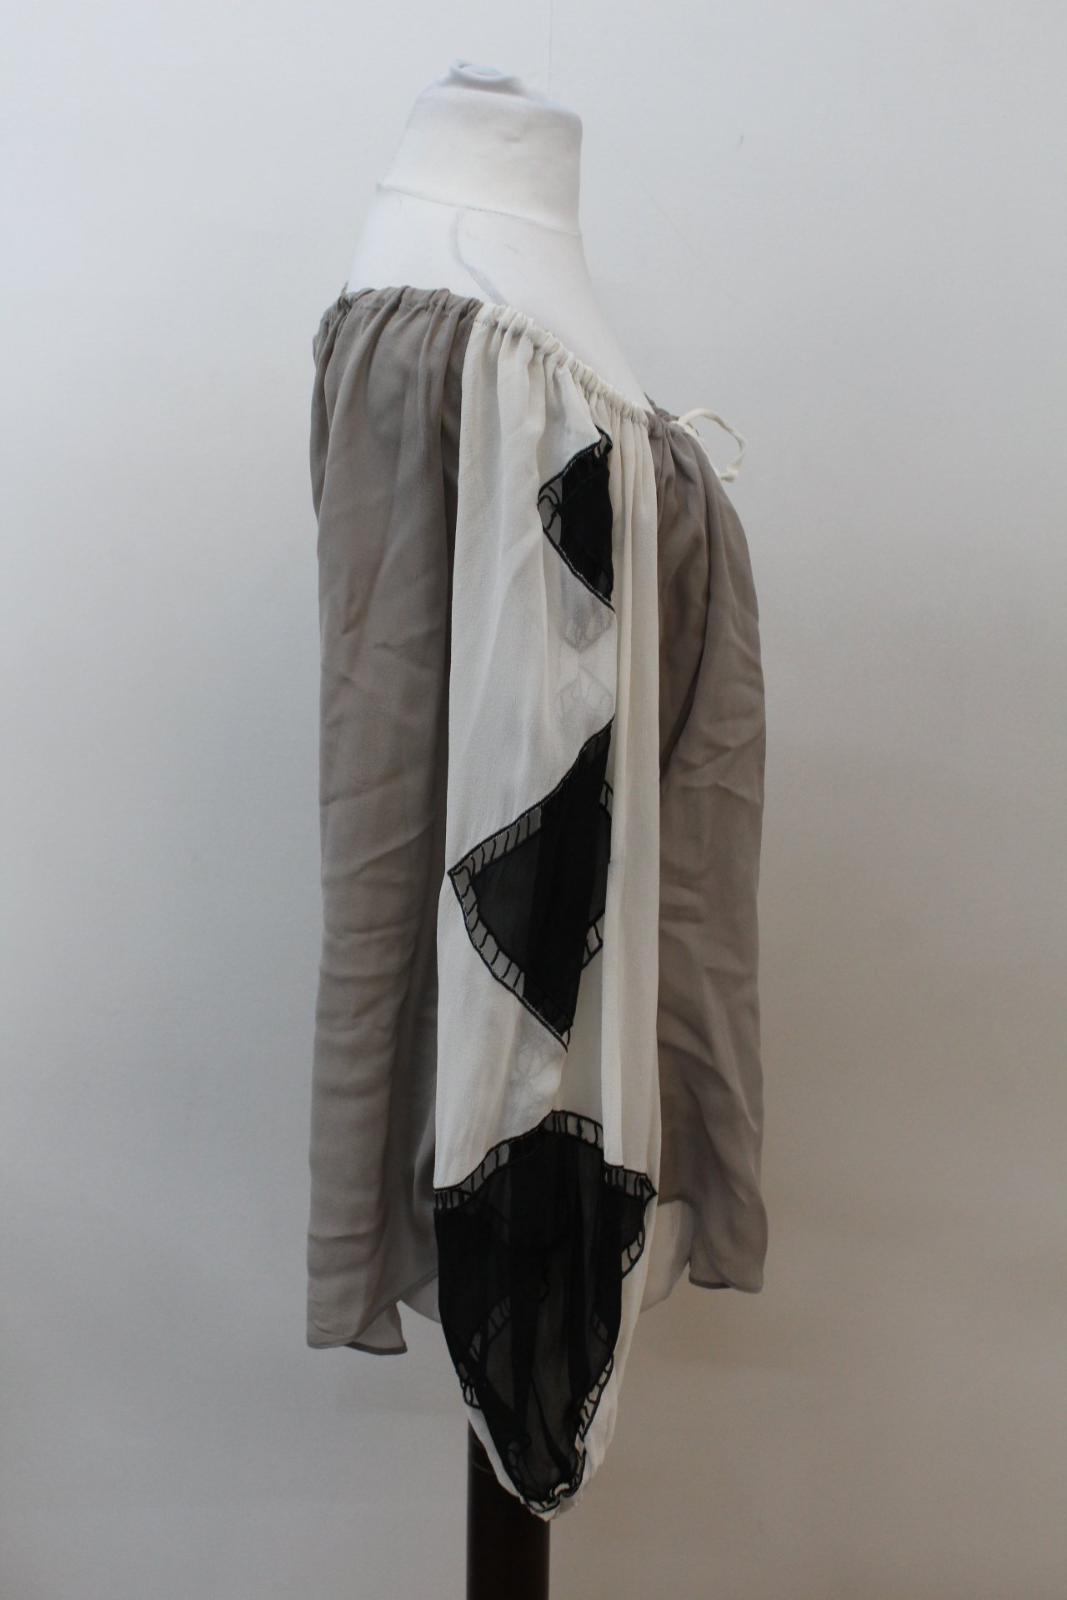 Sheer Ivory London Ladies Blouse Eu36 Out Black Khaki Grey Temperley Uk8 Cut 8fFqIwaaO